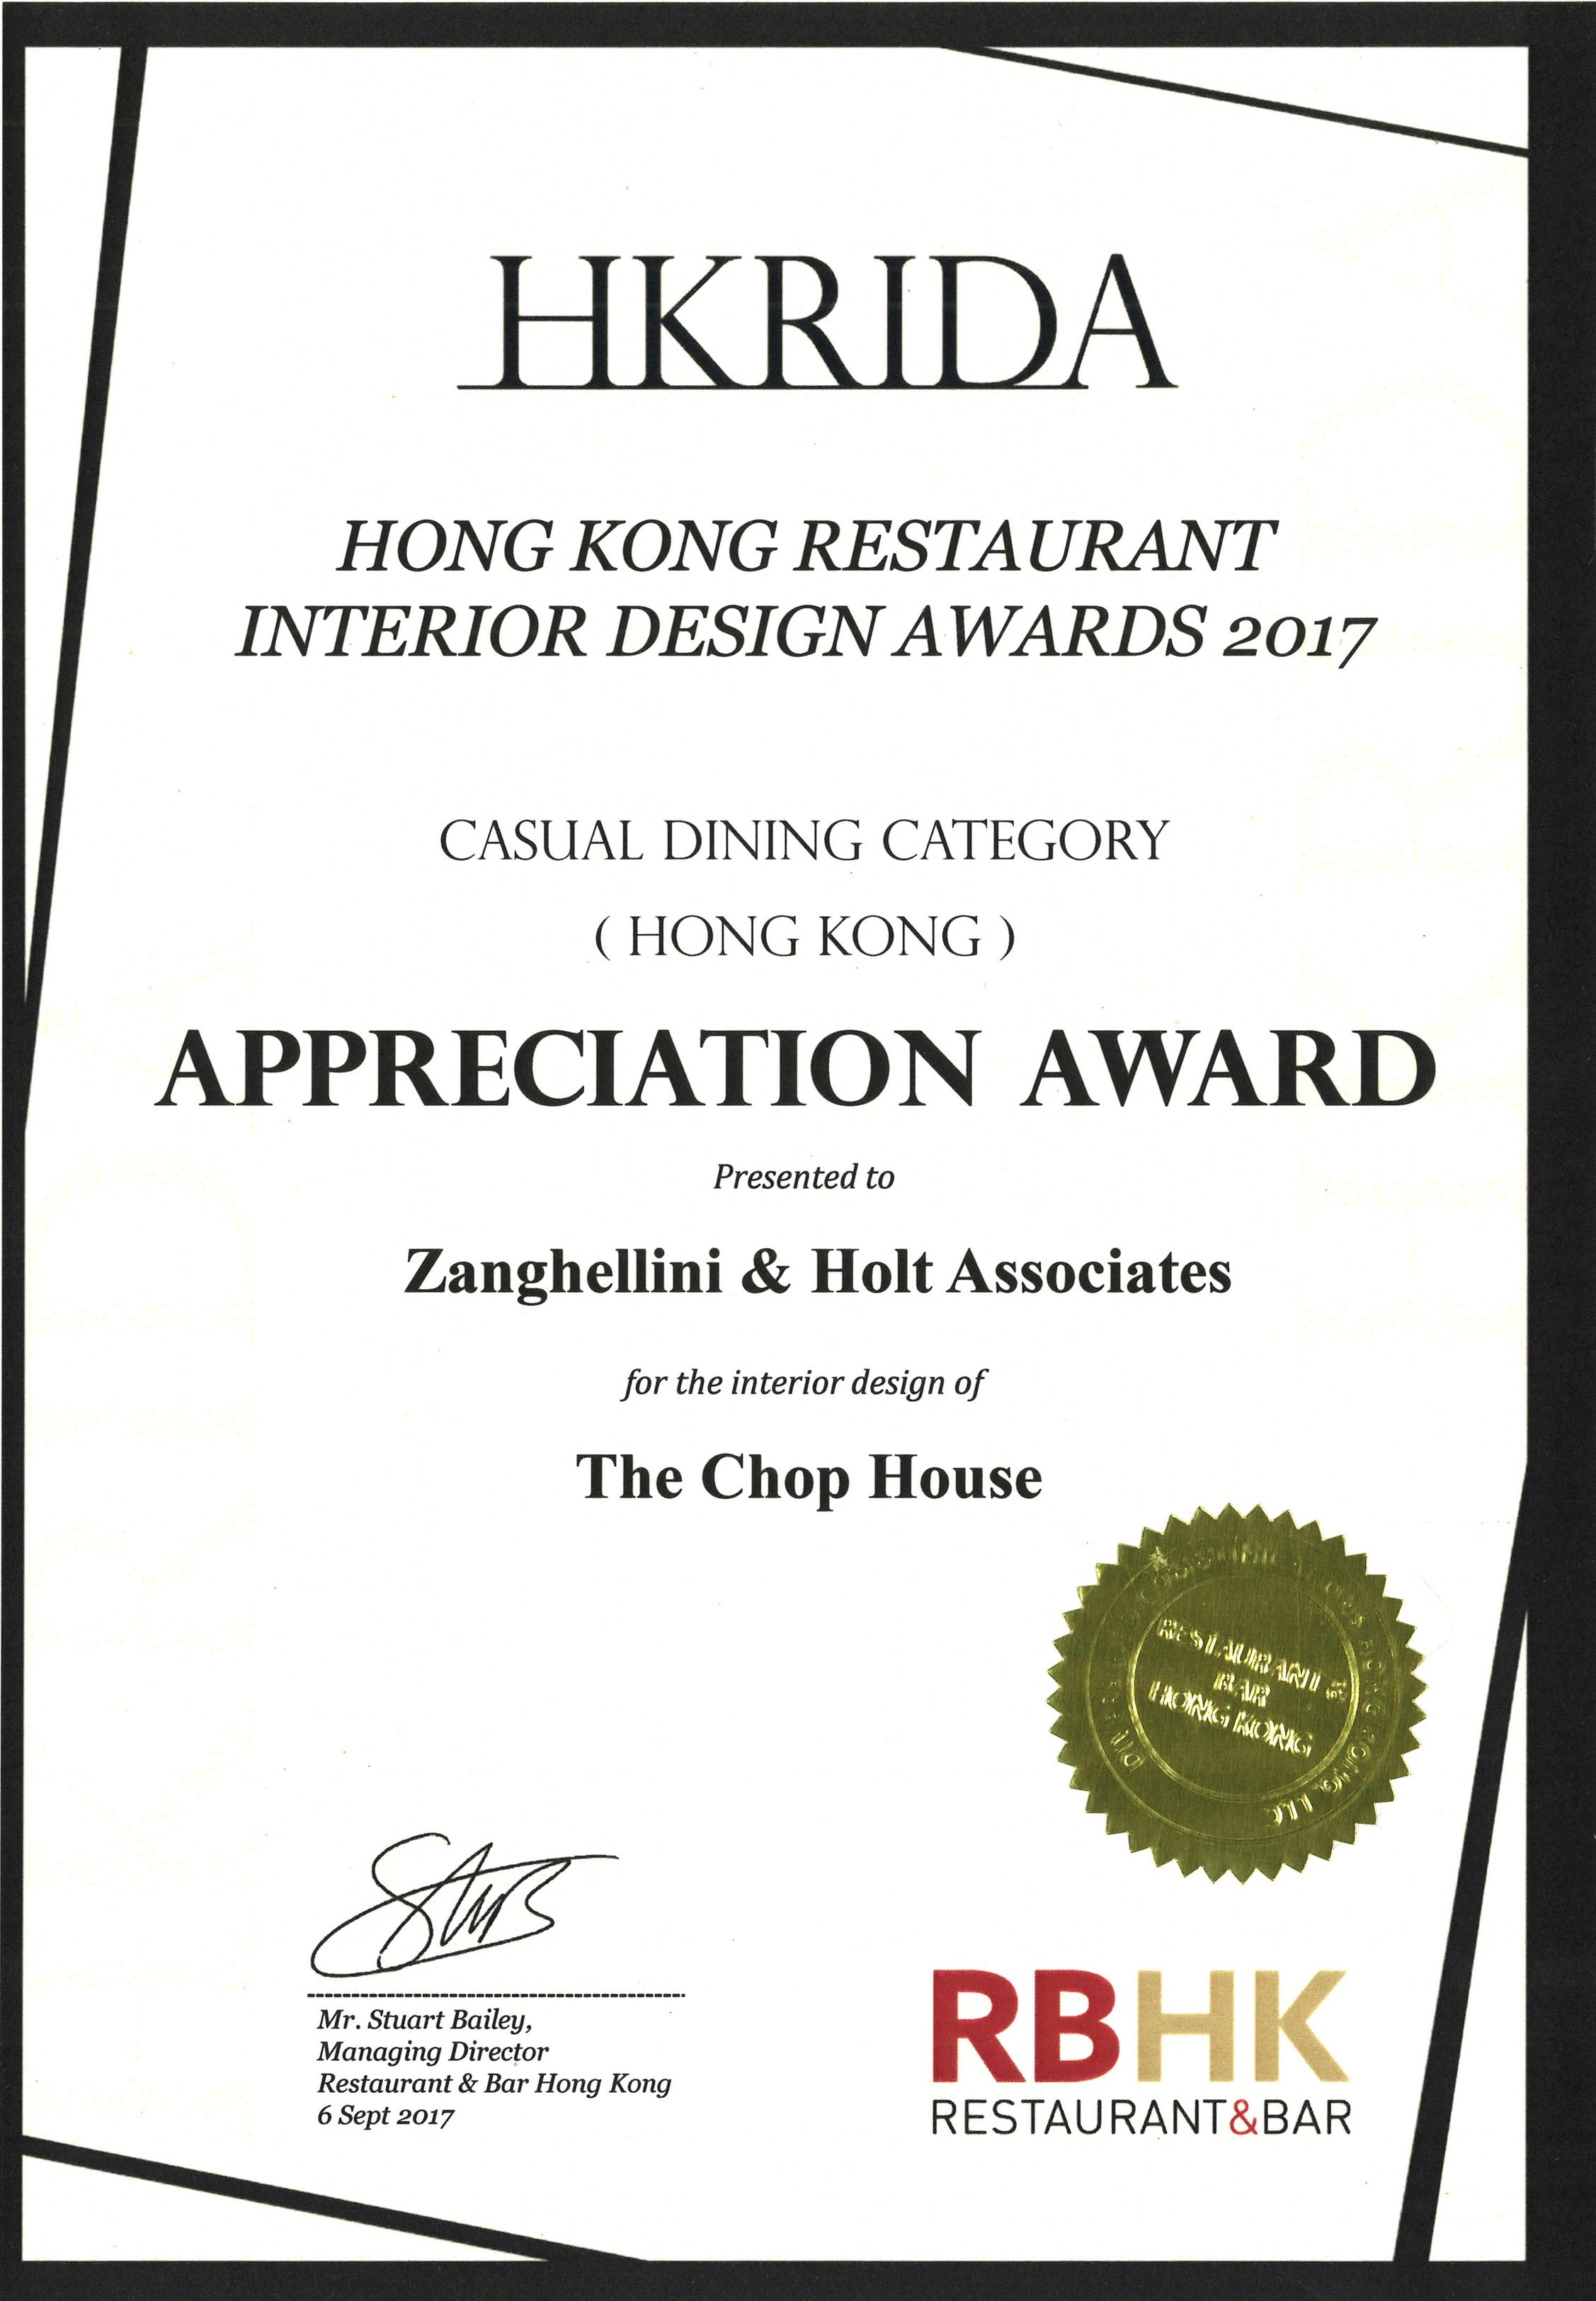 The ChopHouse Zanghellini Holt Associates